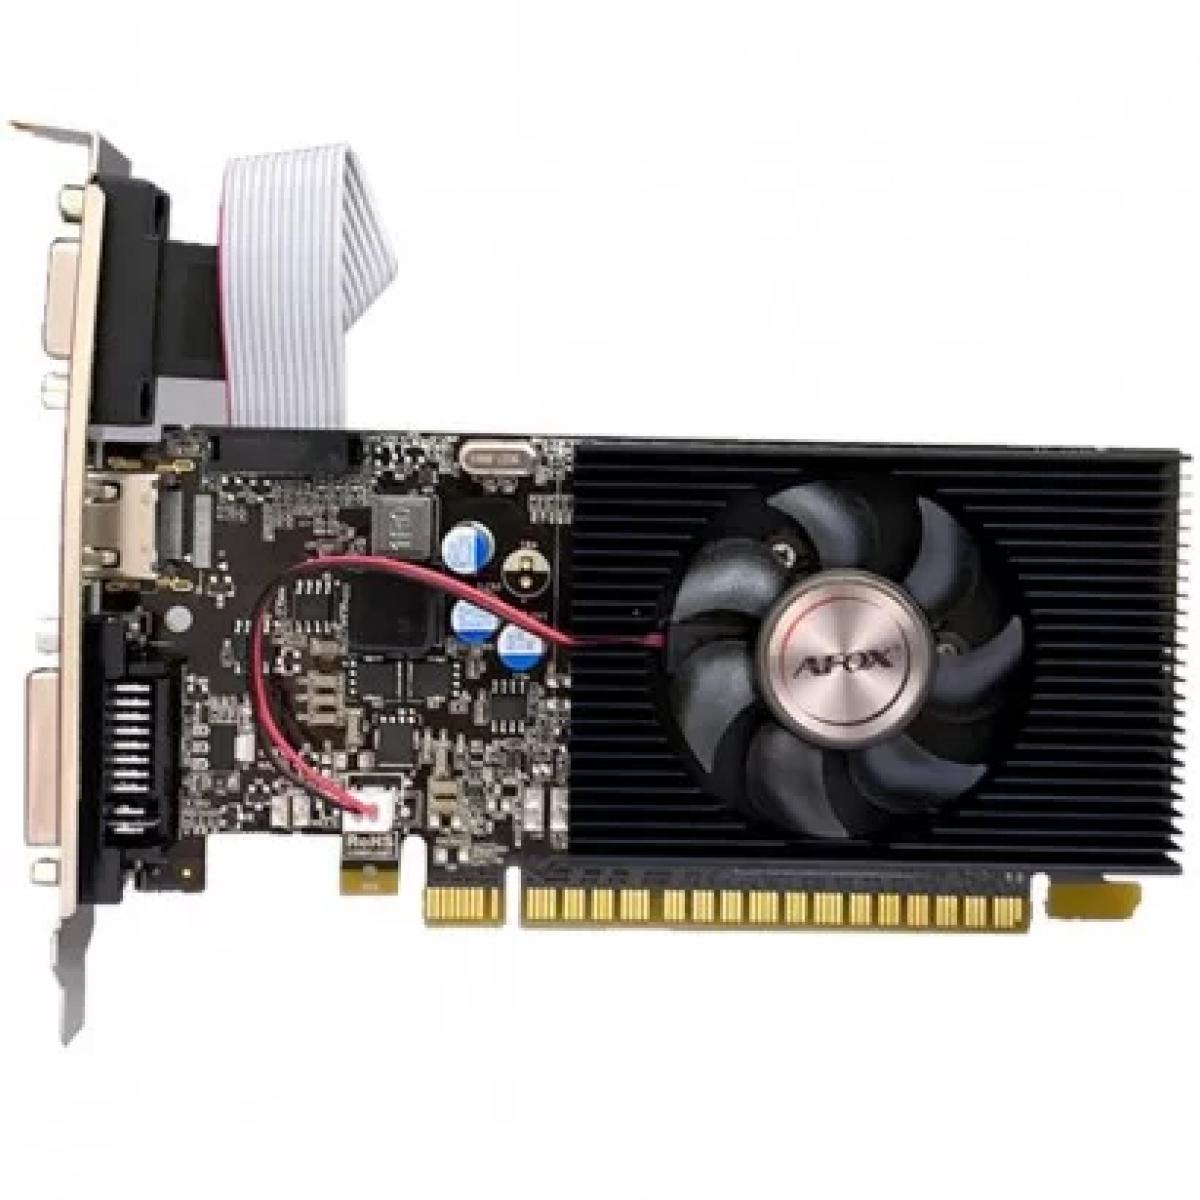 Placa de Vídeo Afox GeForce GT 740, 4GB, GDDR3, 128bit, AF740-4096D3L3